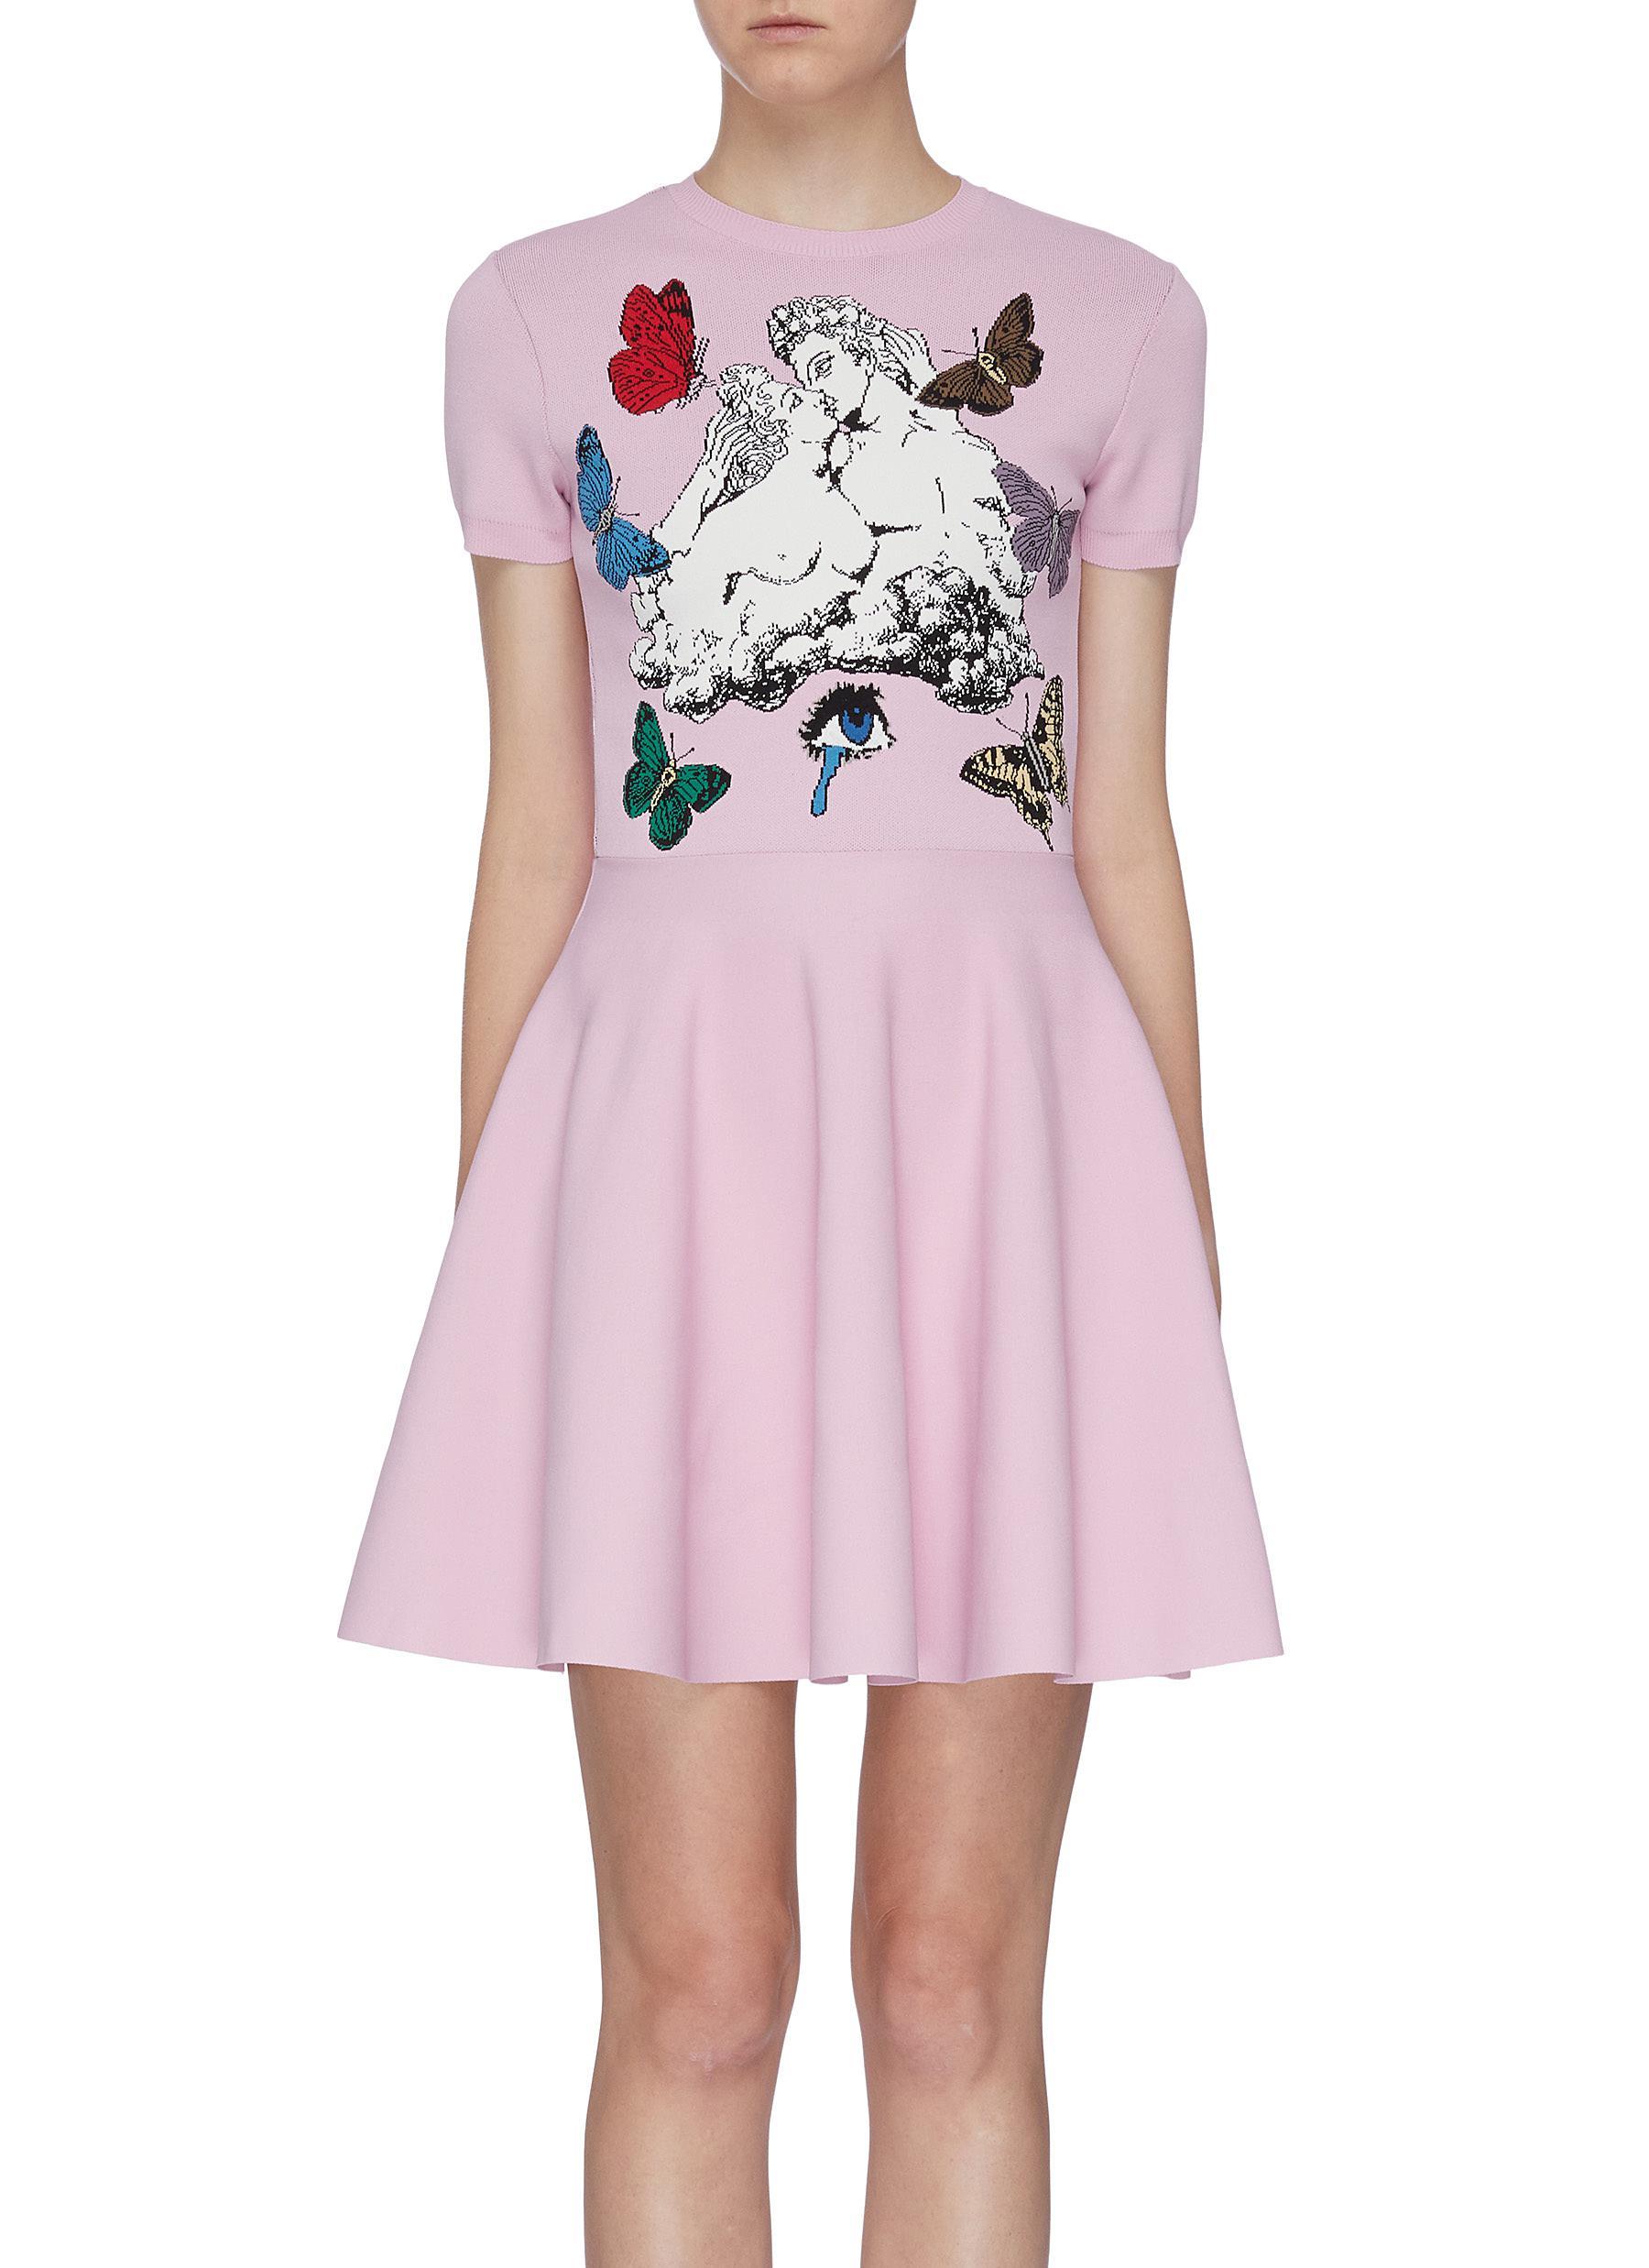 Lovers slogan jacquard flared dress by Valentino